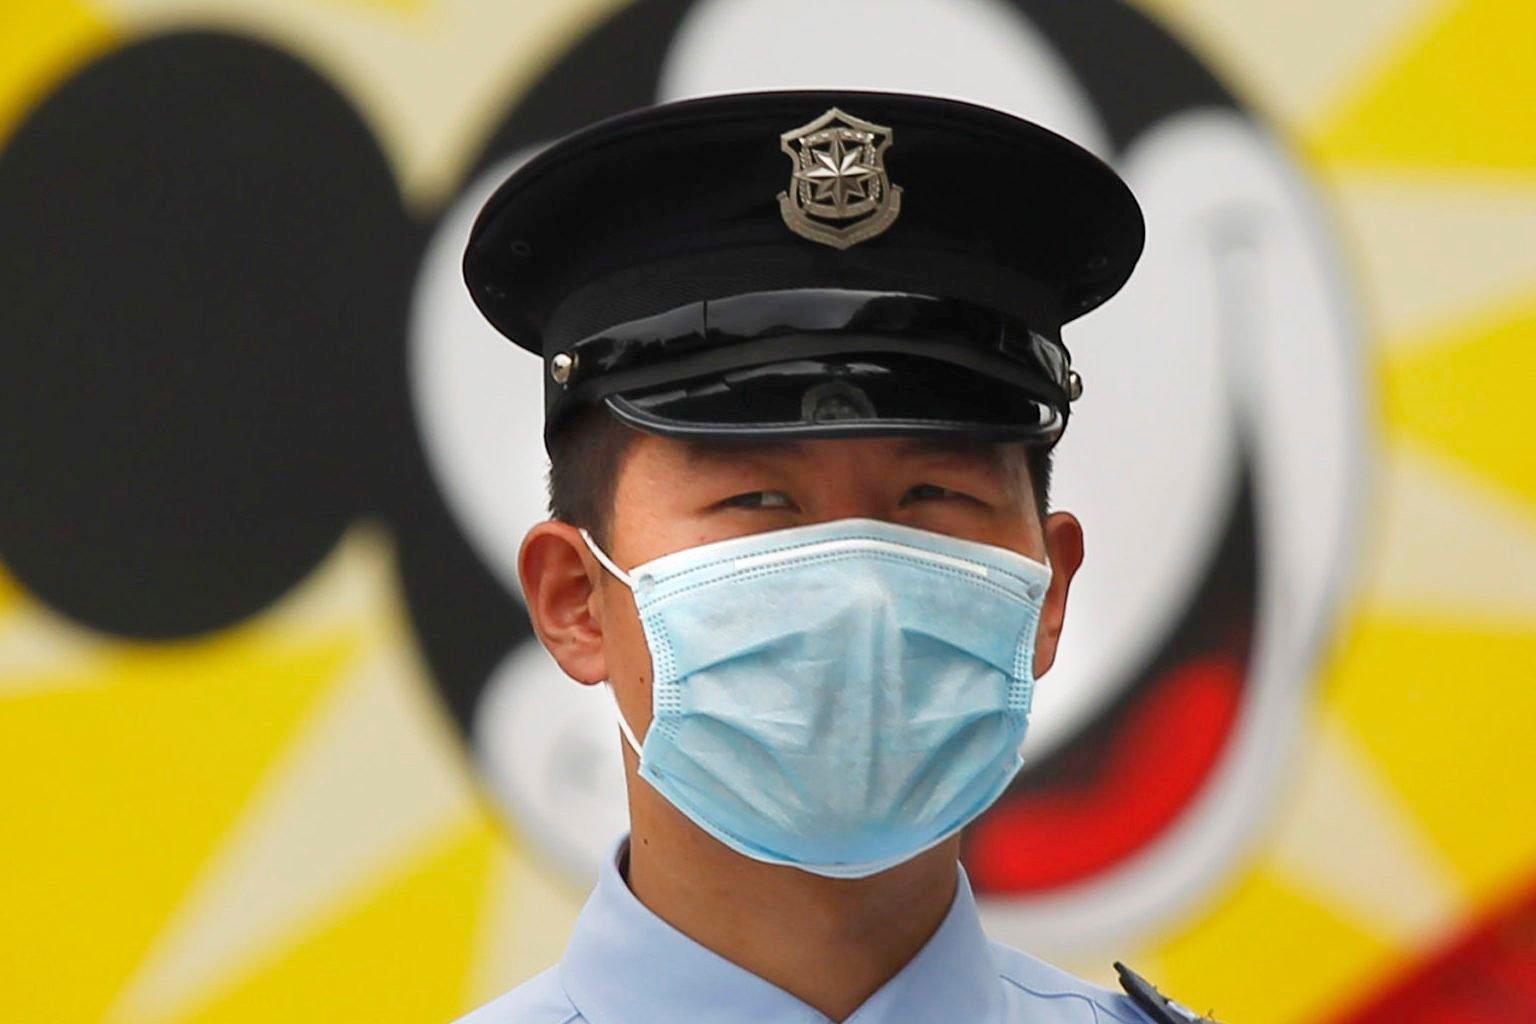 Disney Castmember wearing a mask